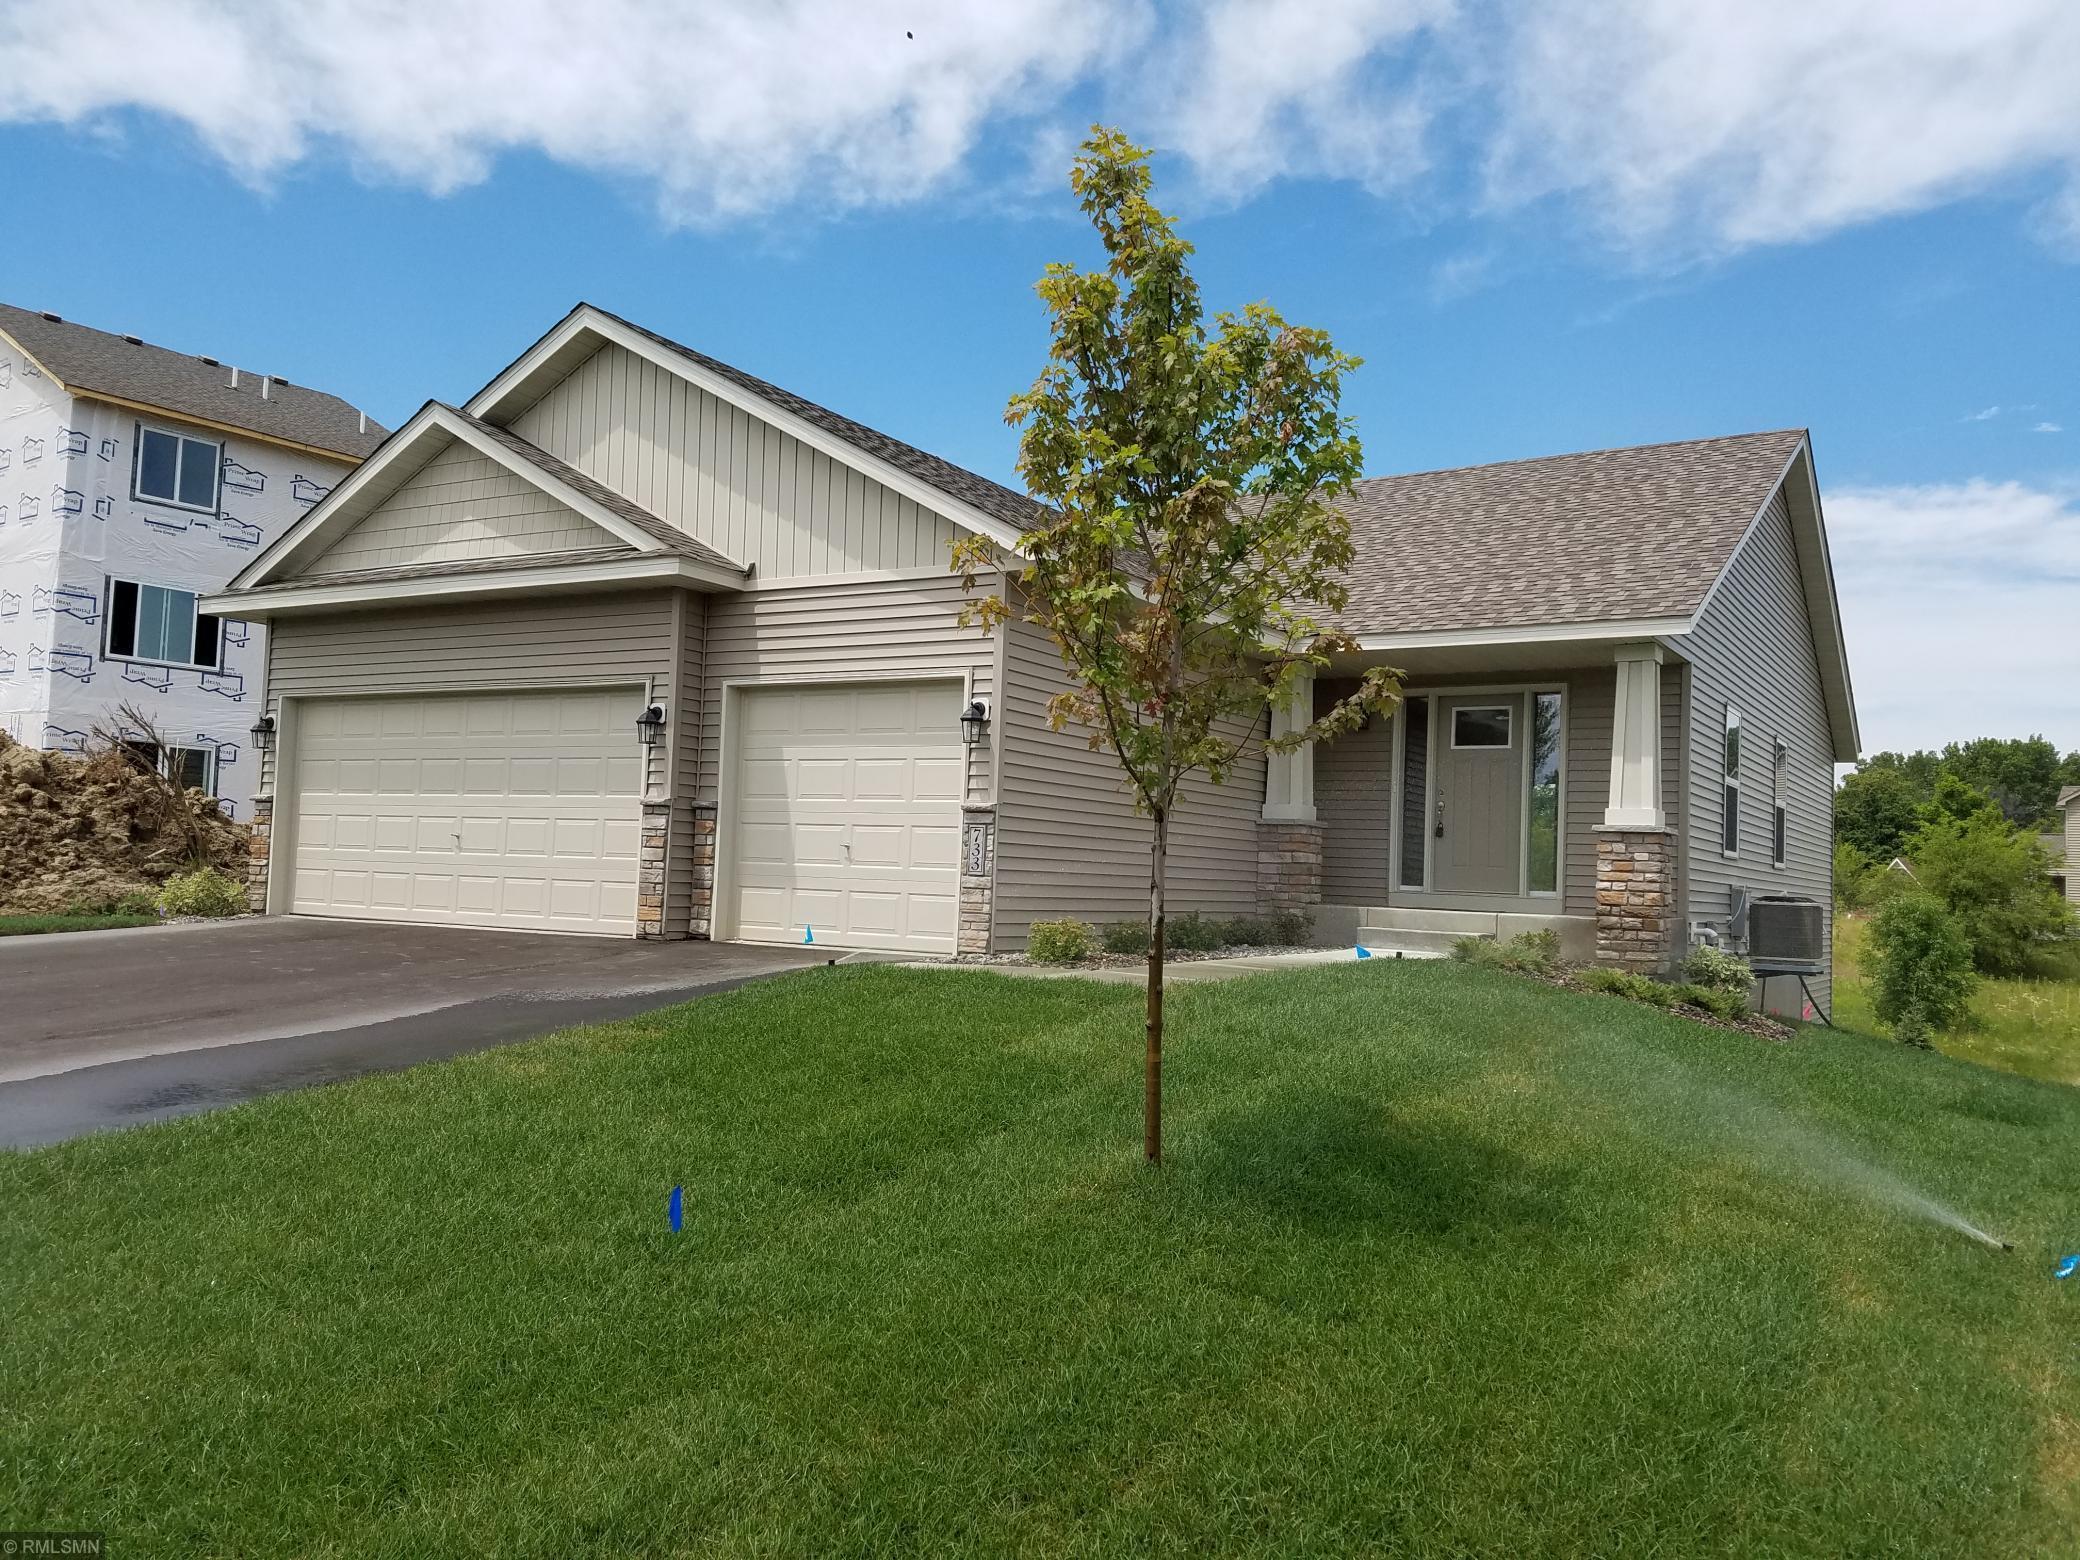 xxx17 438th Avenue Property Photo - Prescott, WI real estate listing